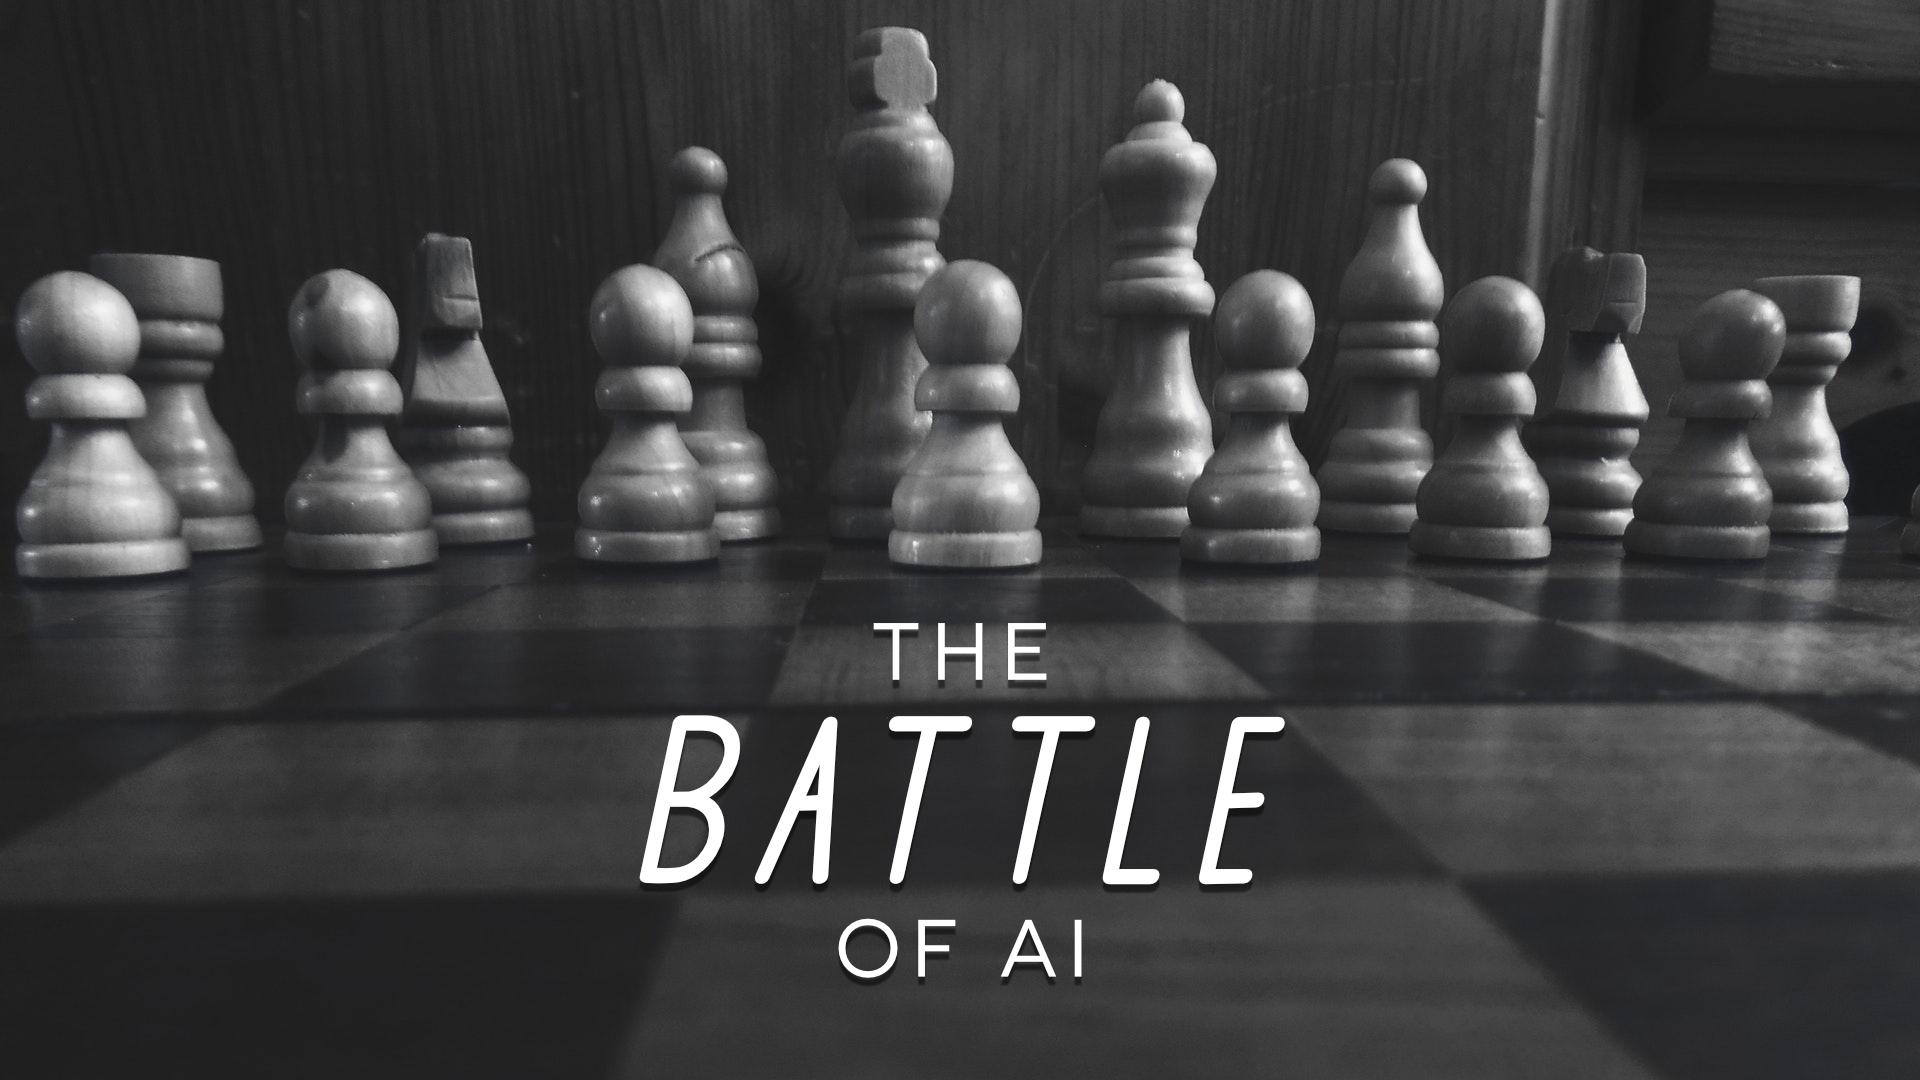 2019-03-10 The Battle of Ai.jpg